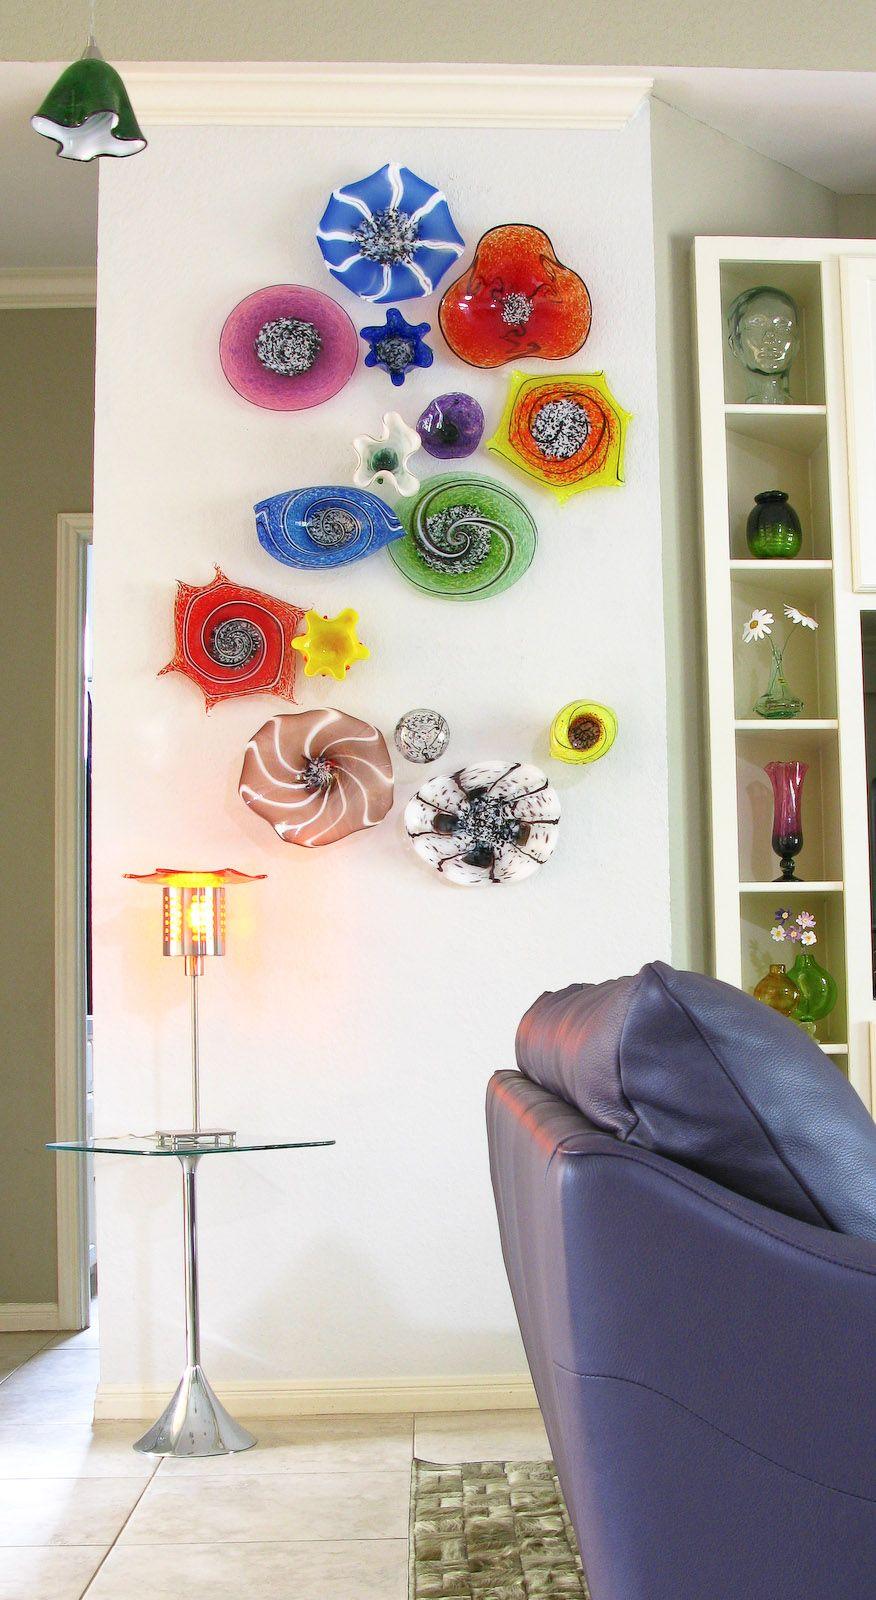 Dragon Series Wall Art Collection Blown Glass Wall Art Fused Glass Wall Art Glass Wall Art